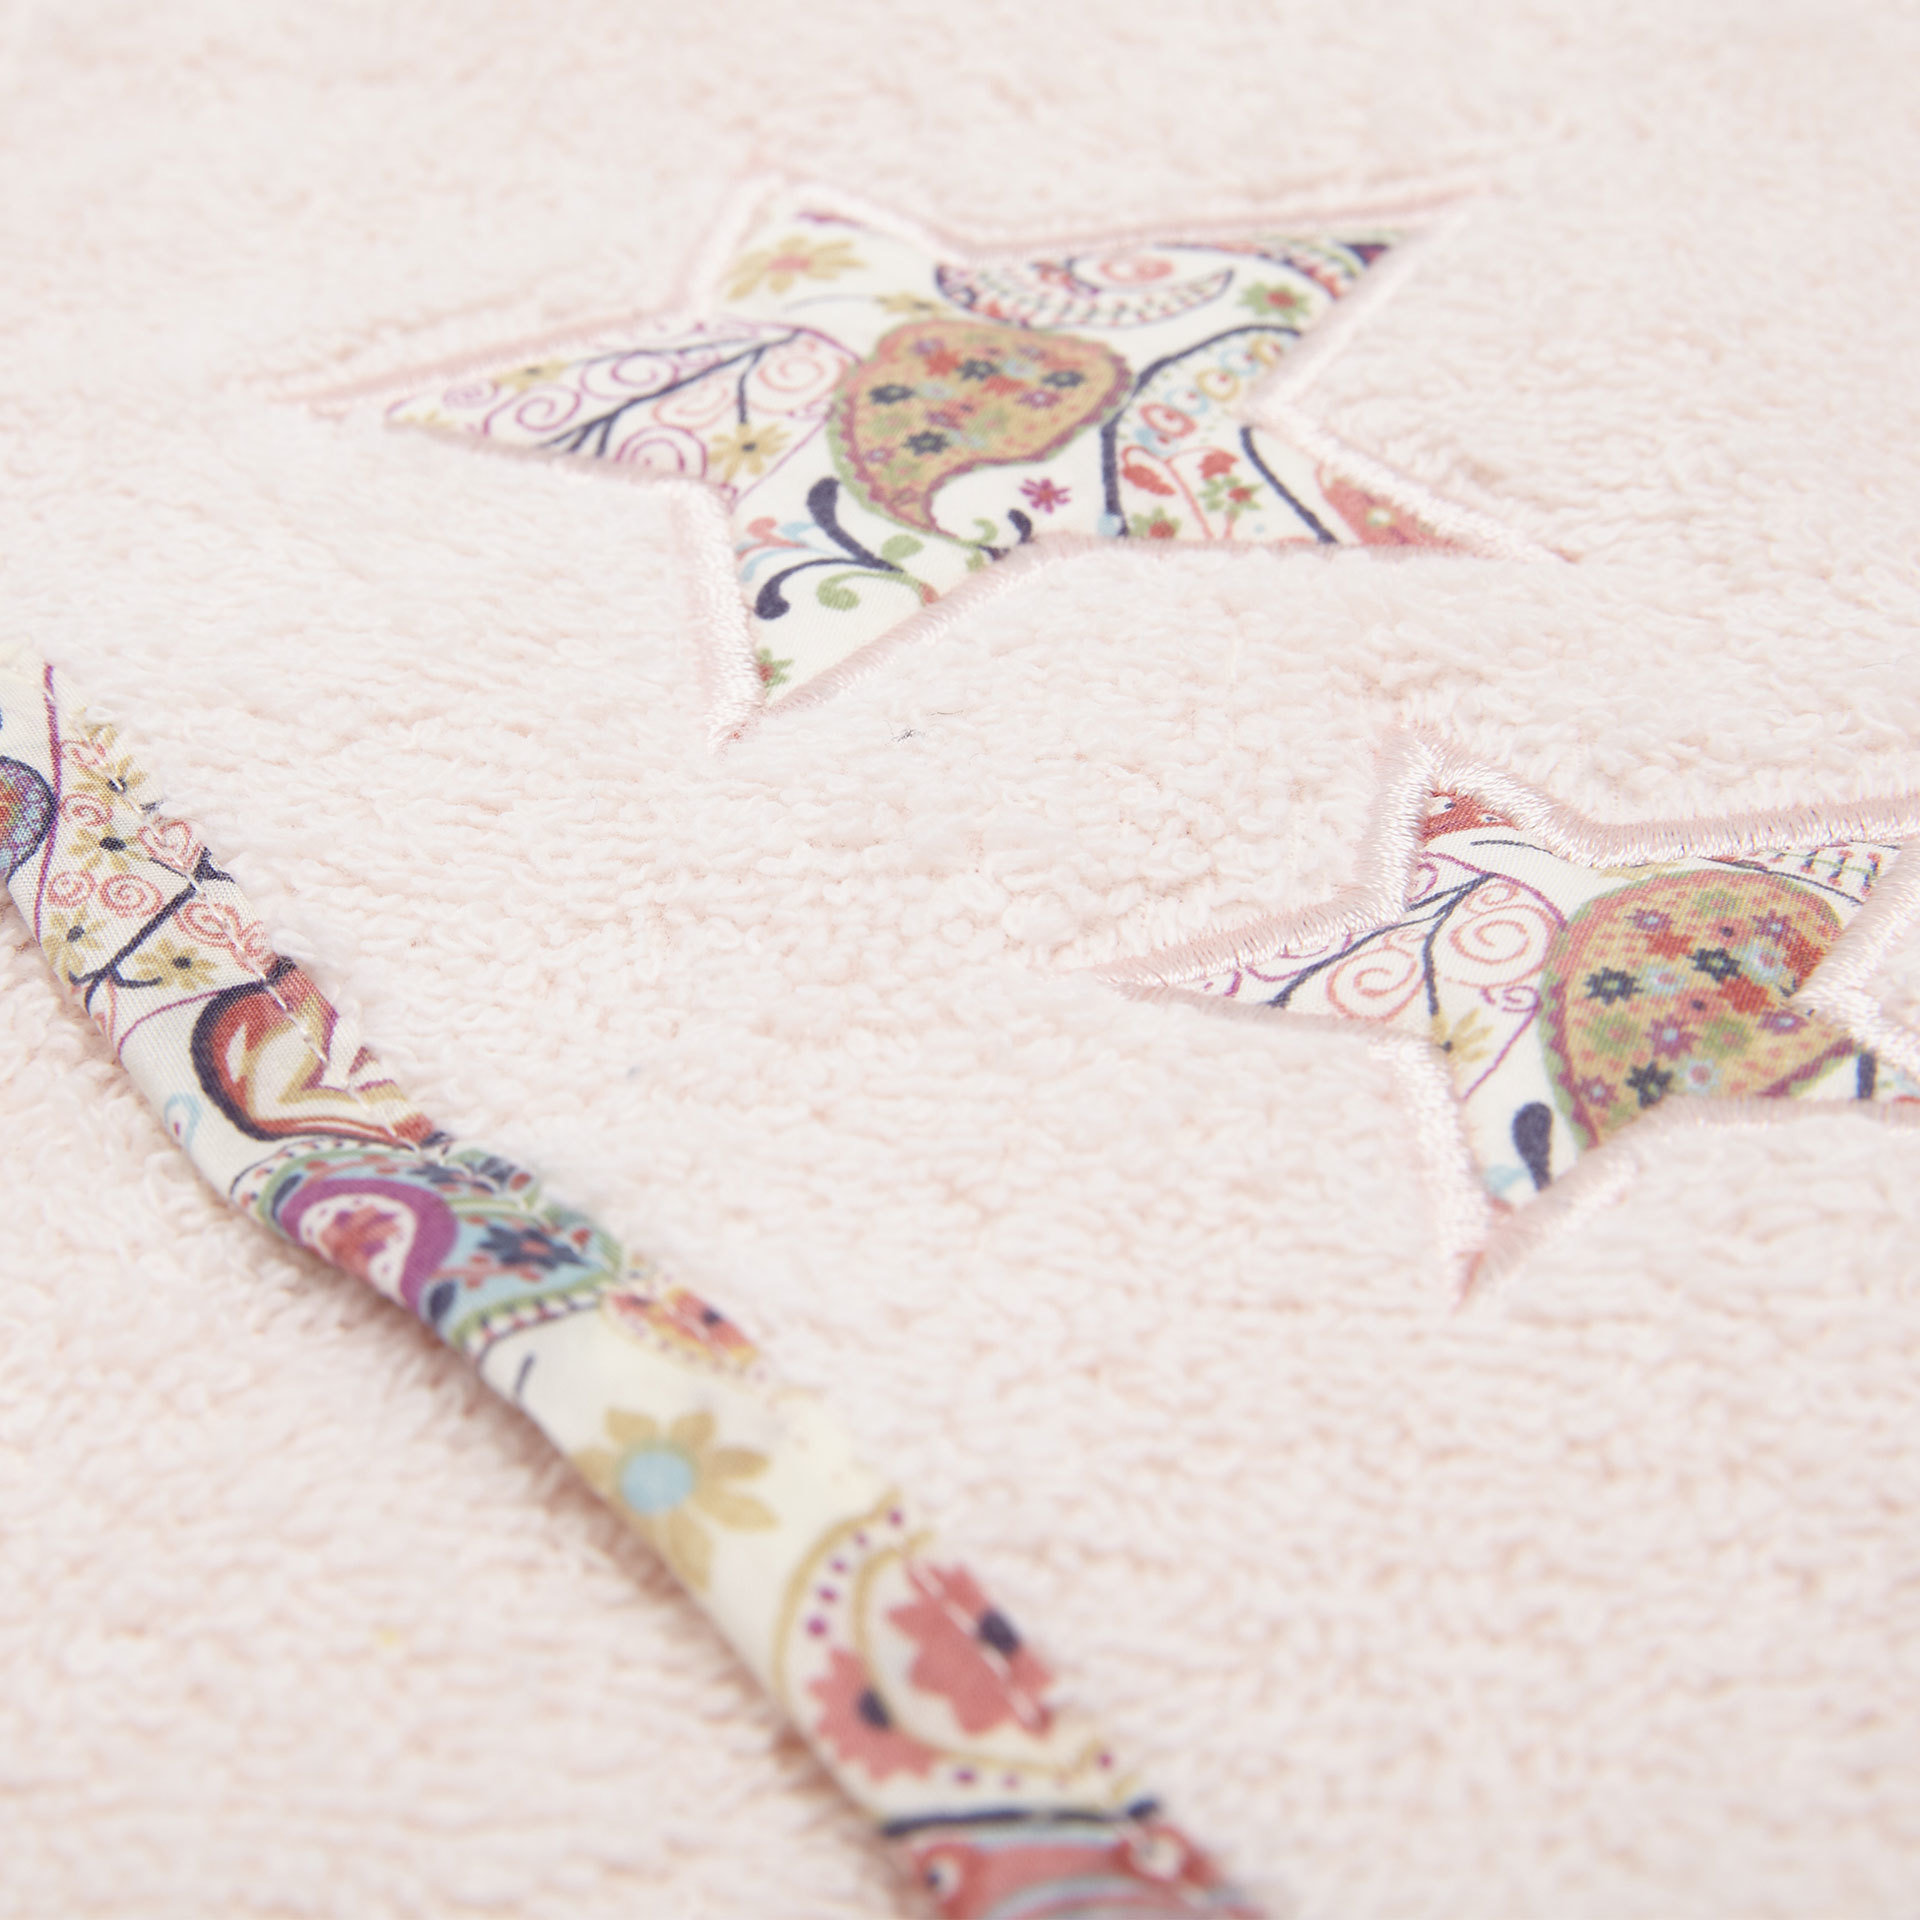 Star Applique Machine Embroidery Design Free - 3 sizes